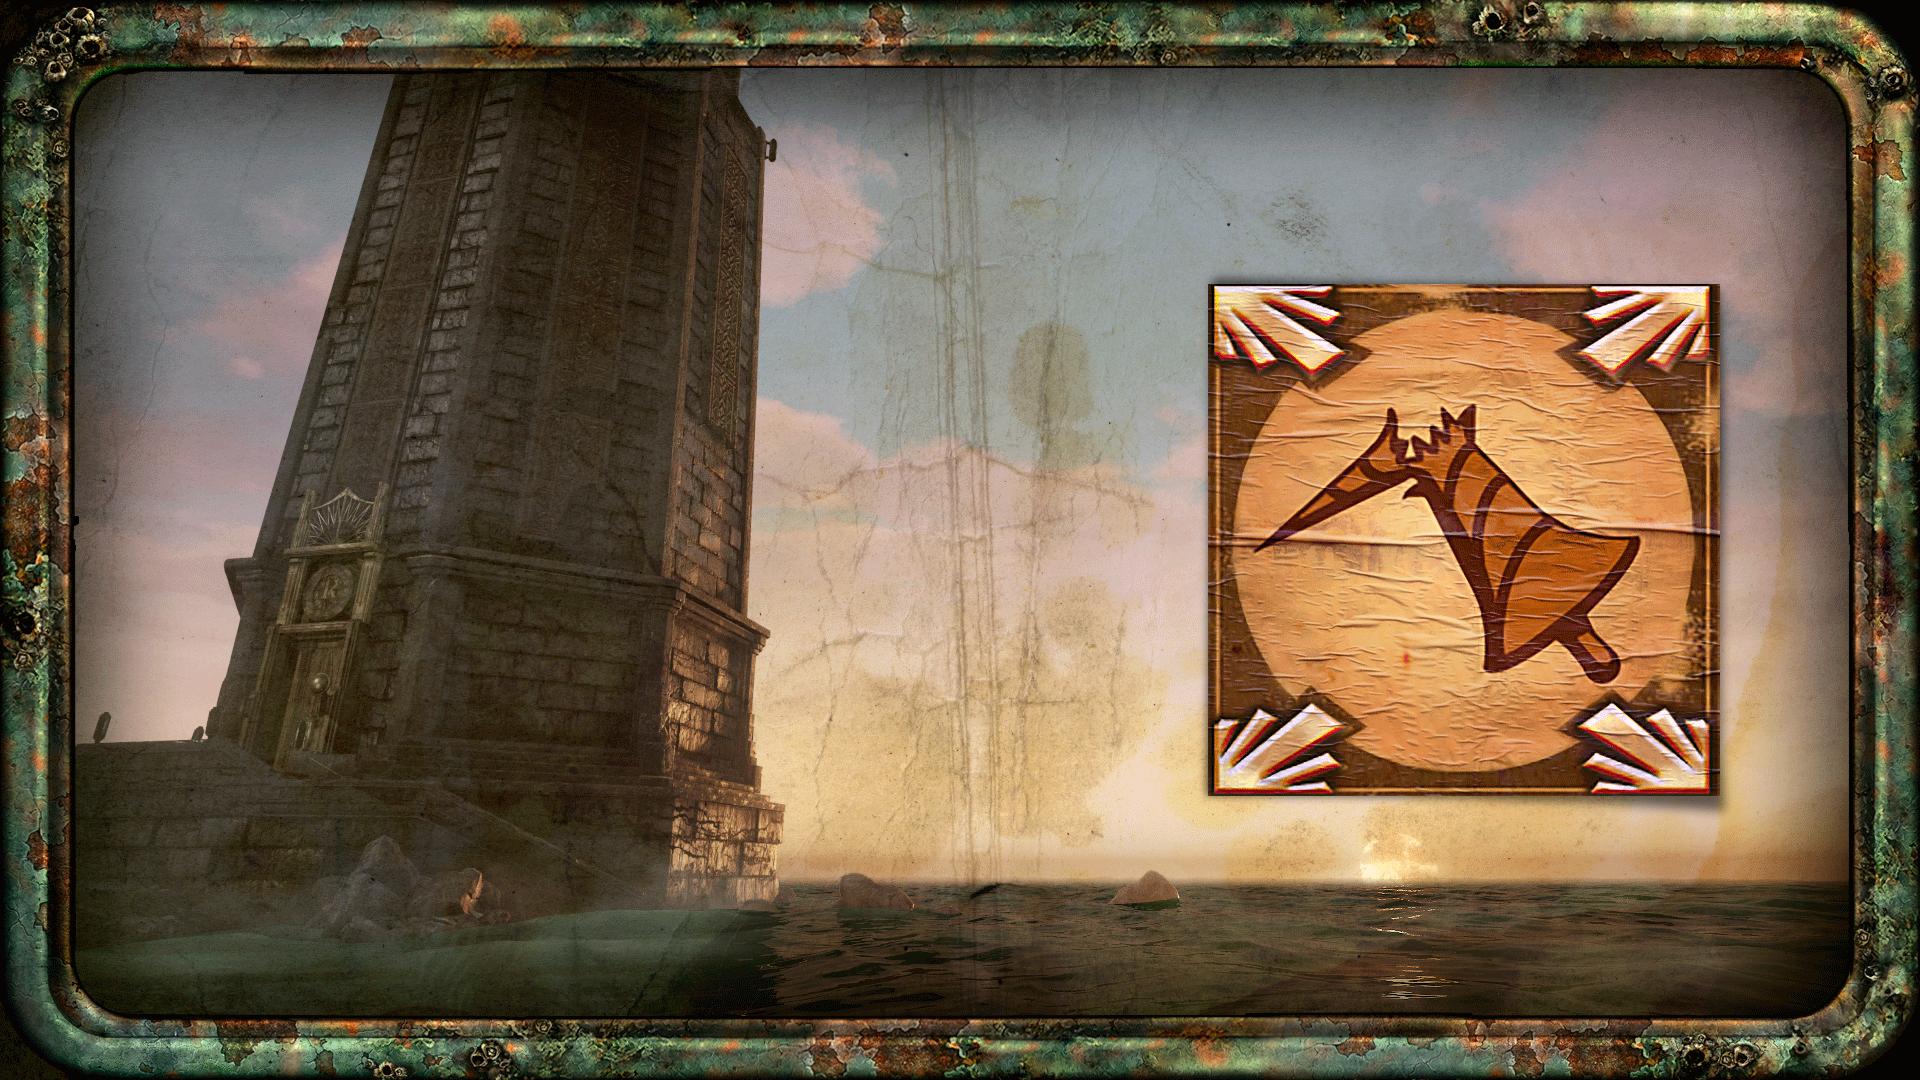 Xbox Bioshock 2 Achievements Find Your Xbox Achievements On